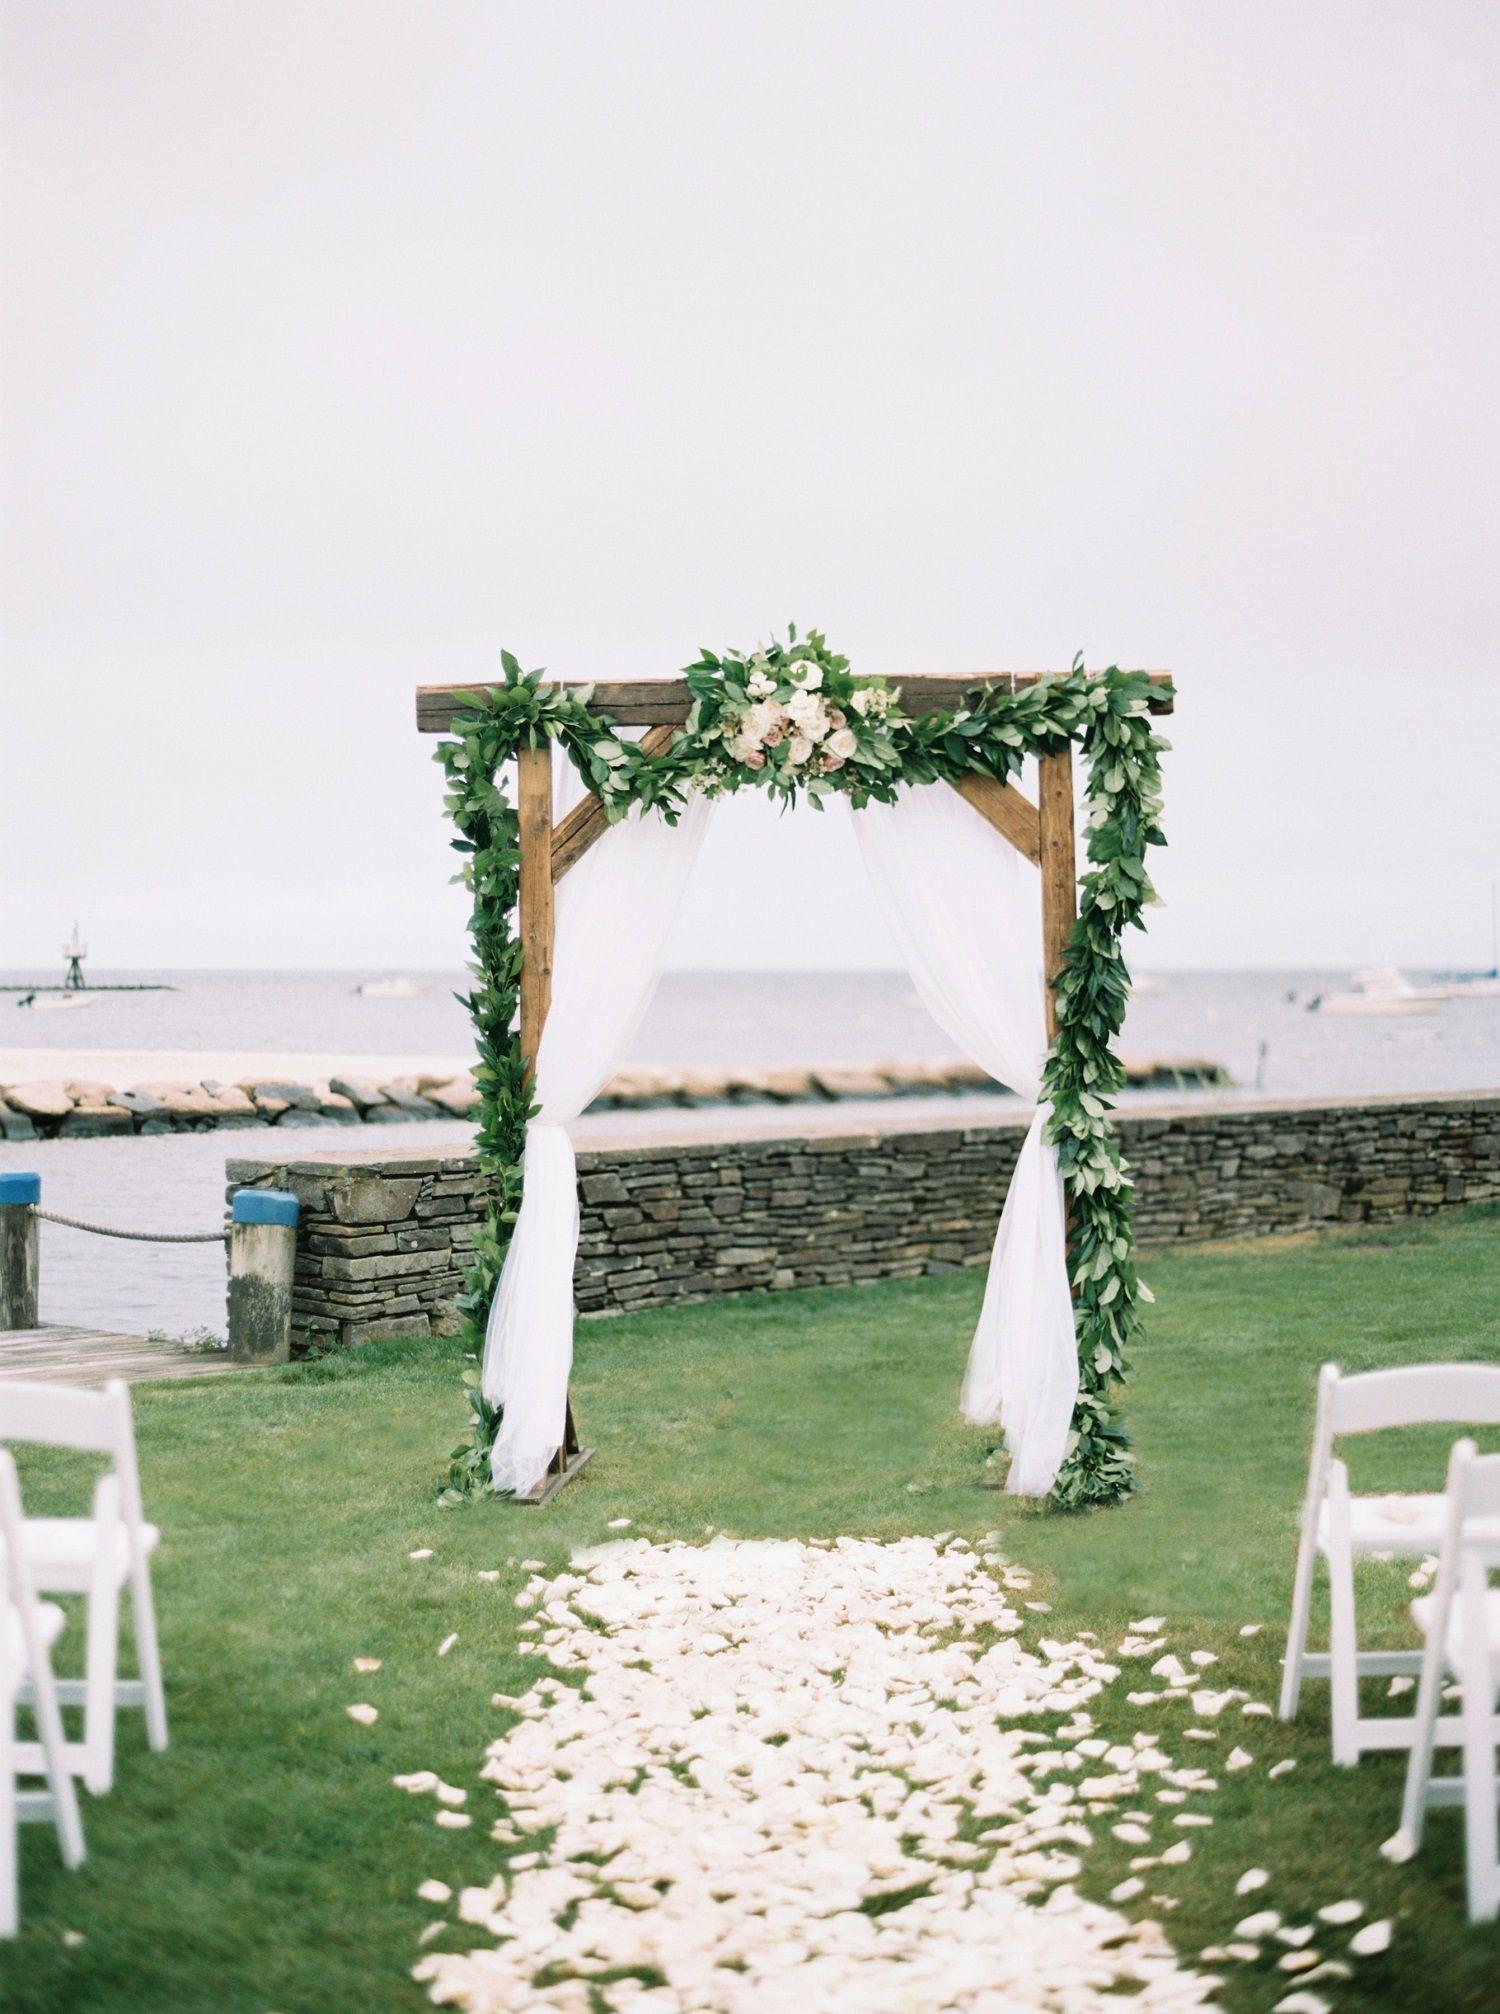 Brides Oceanfront Summer Wedding Wychmere Beach Club Longwood Venues Elizabeth Laduca Photography New England